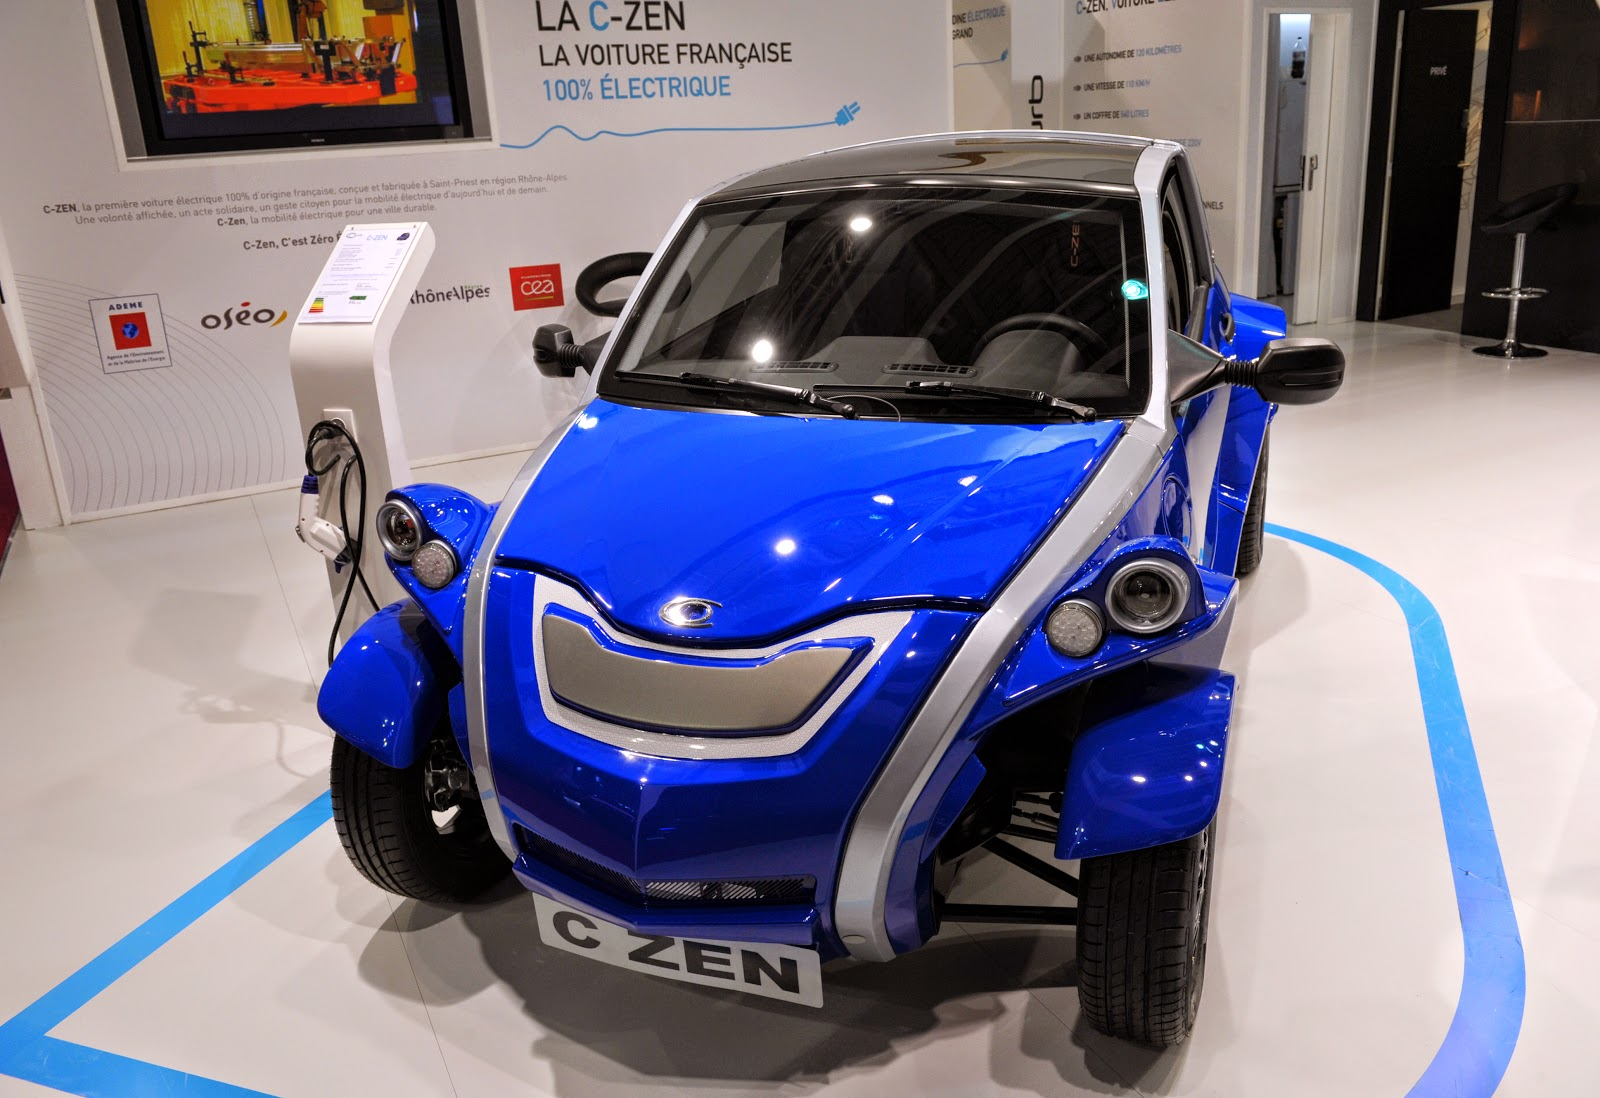 Paris Auto Show 2014 in HD Pictures